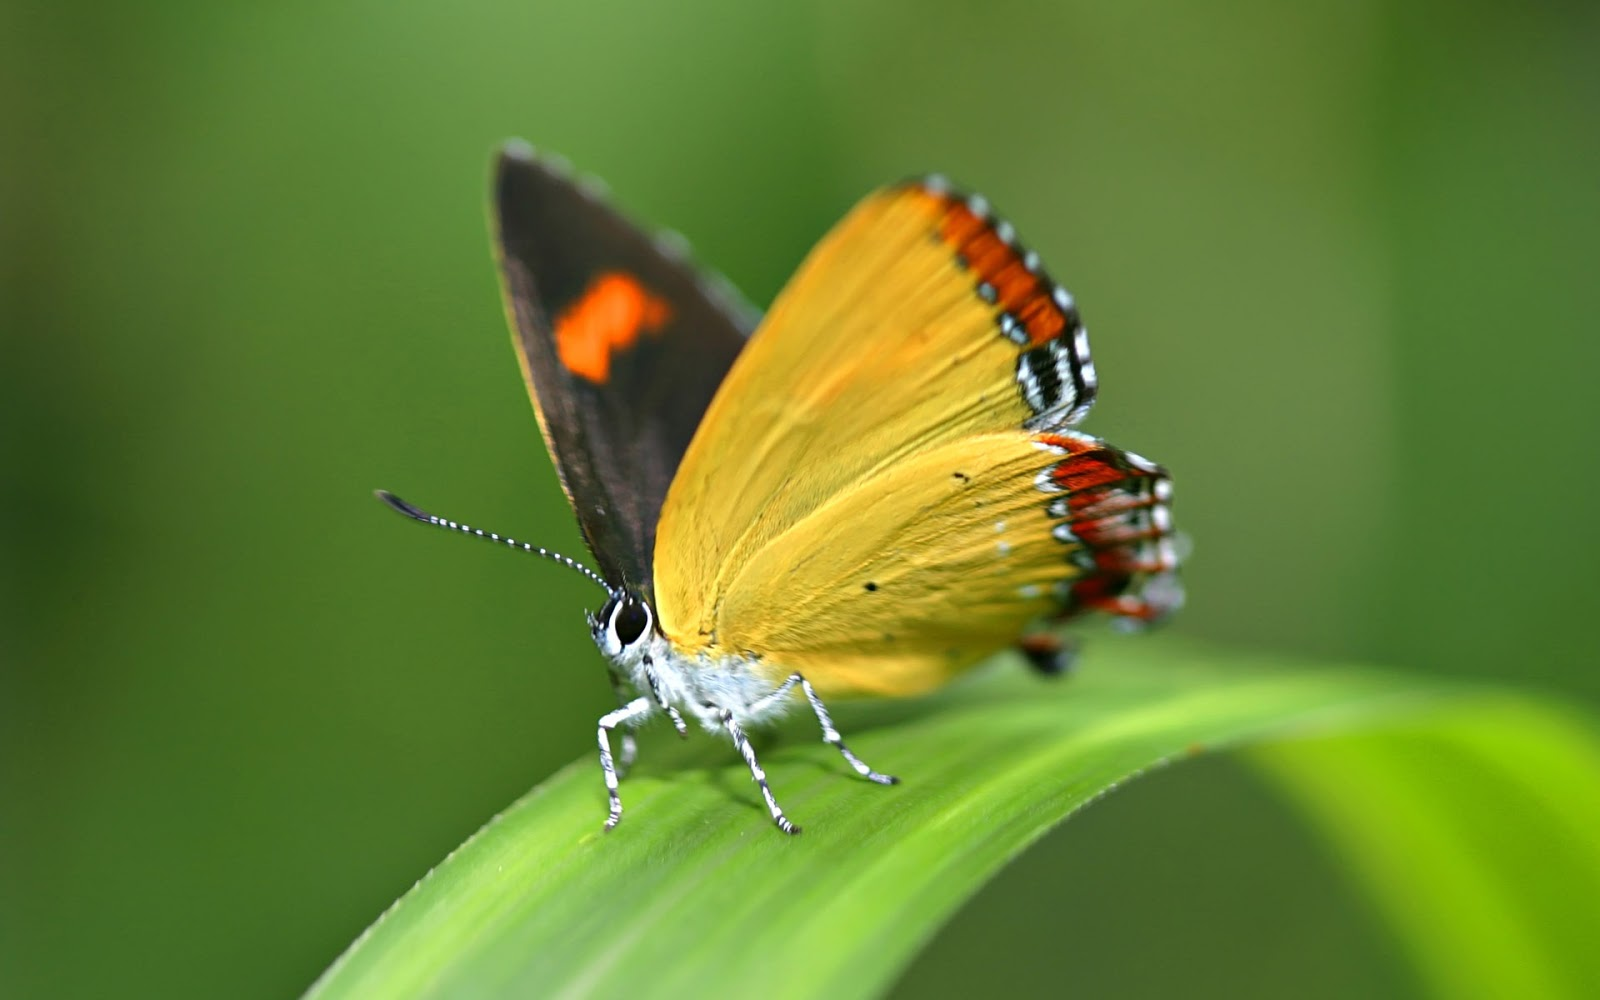 Beautiful Wallpapers For Desktop Beautiful HD Butterfly wallpapers 1600x1000